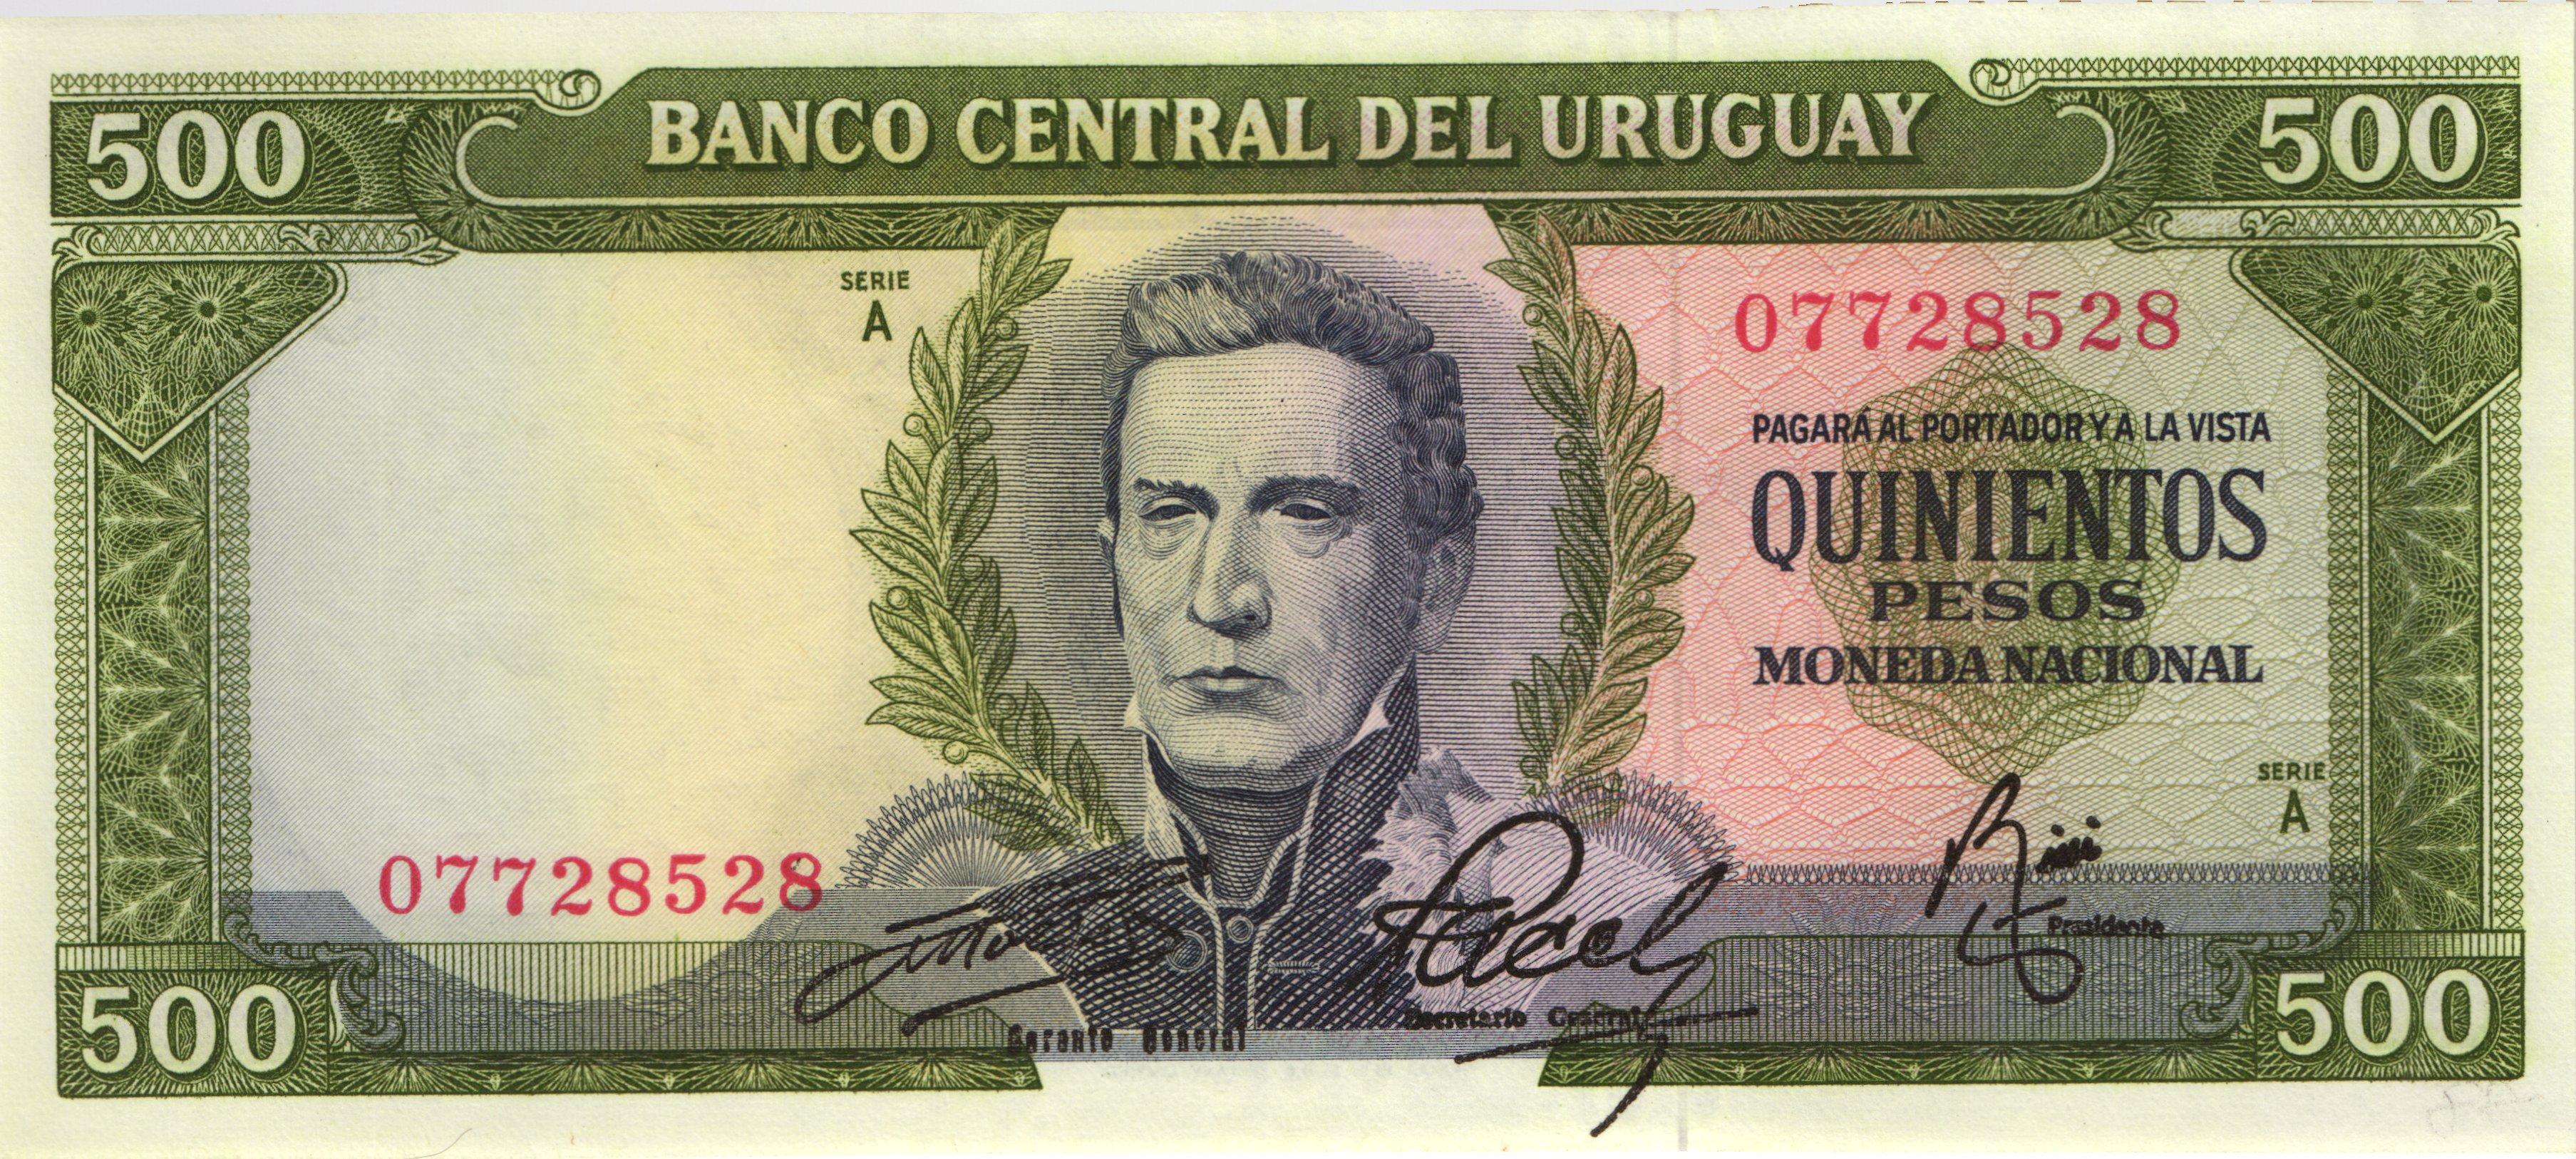 RealBanknotes.com > Uruguay p78a: 500 Pesos Uruguayos from